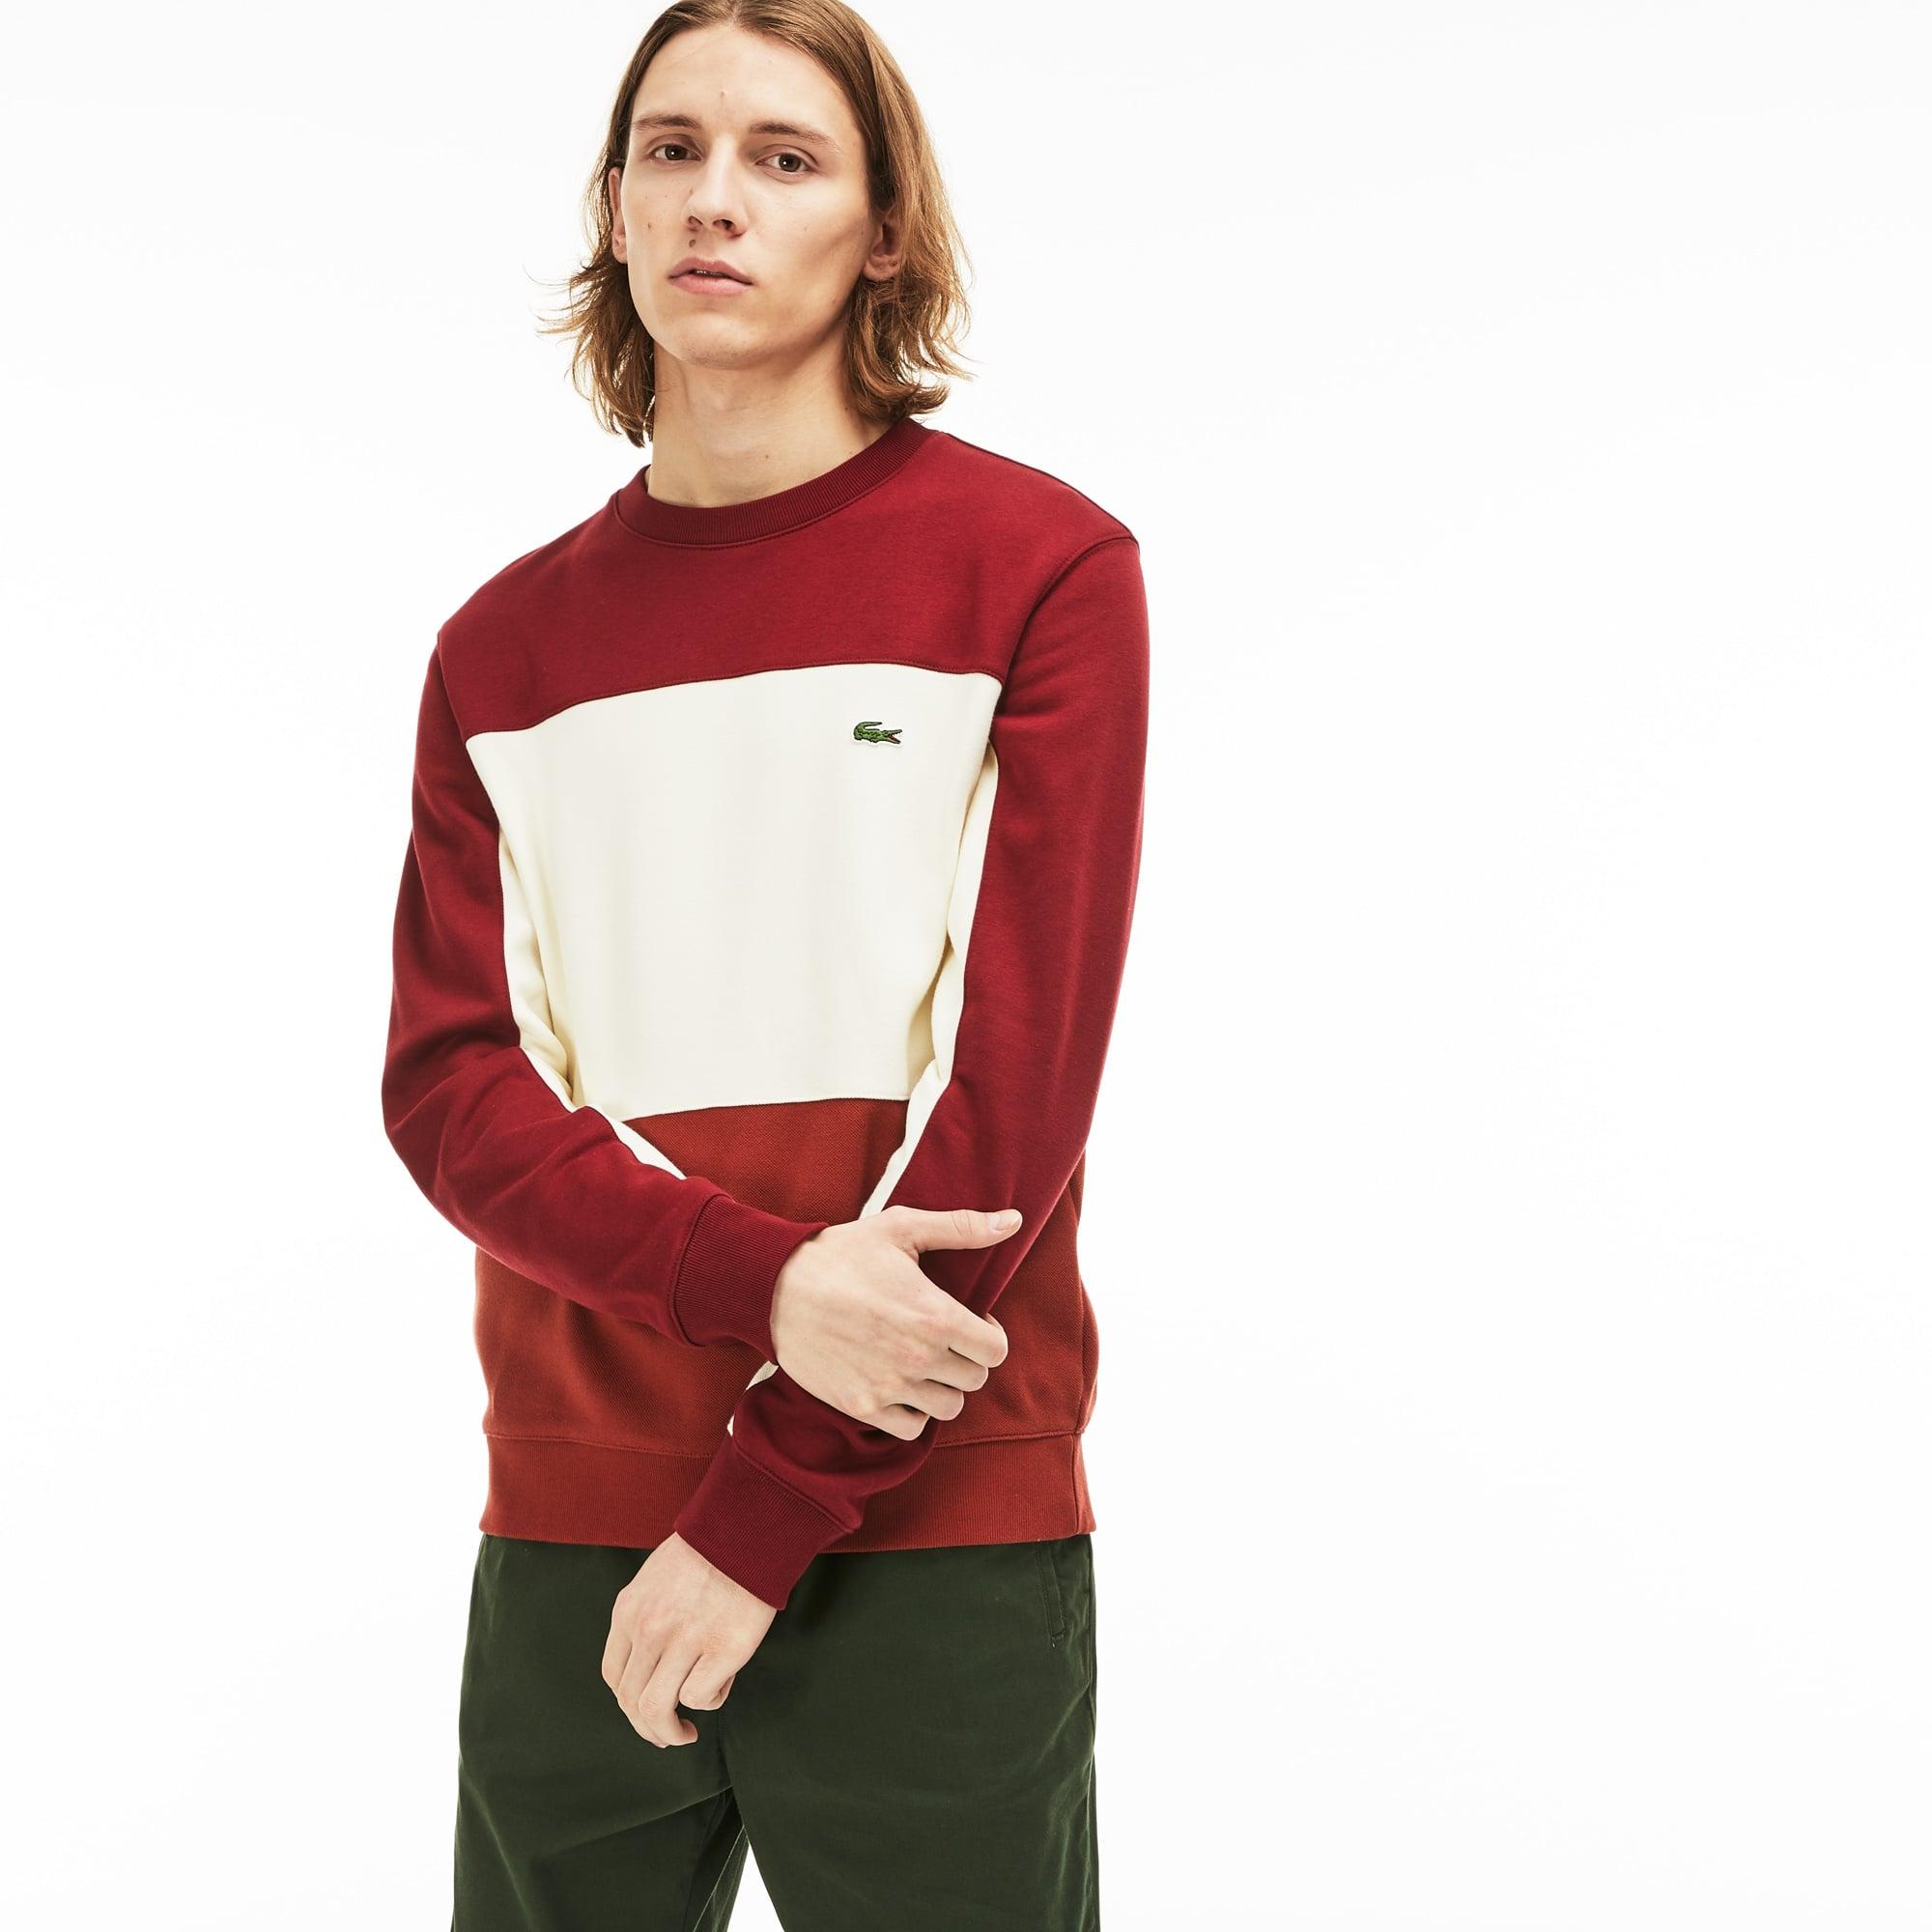 c6af460ad1 + 1 color. New Arrival. Men's Crew Neck Colourblock Piqué Fleece Sweatshirt